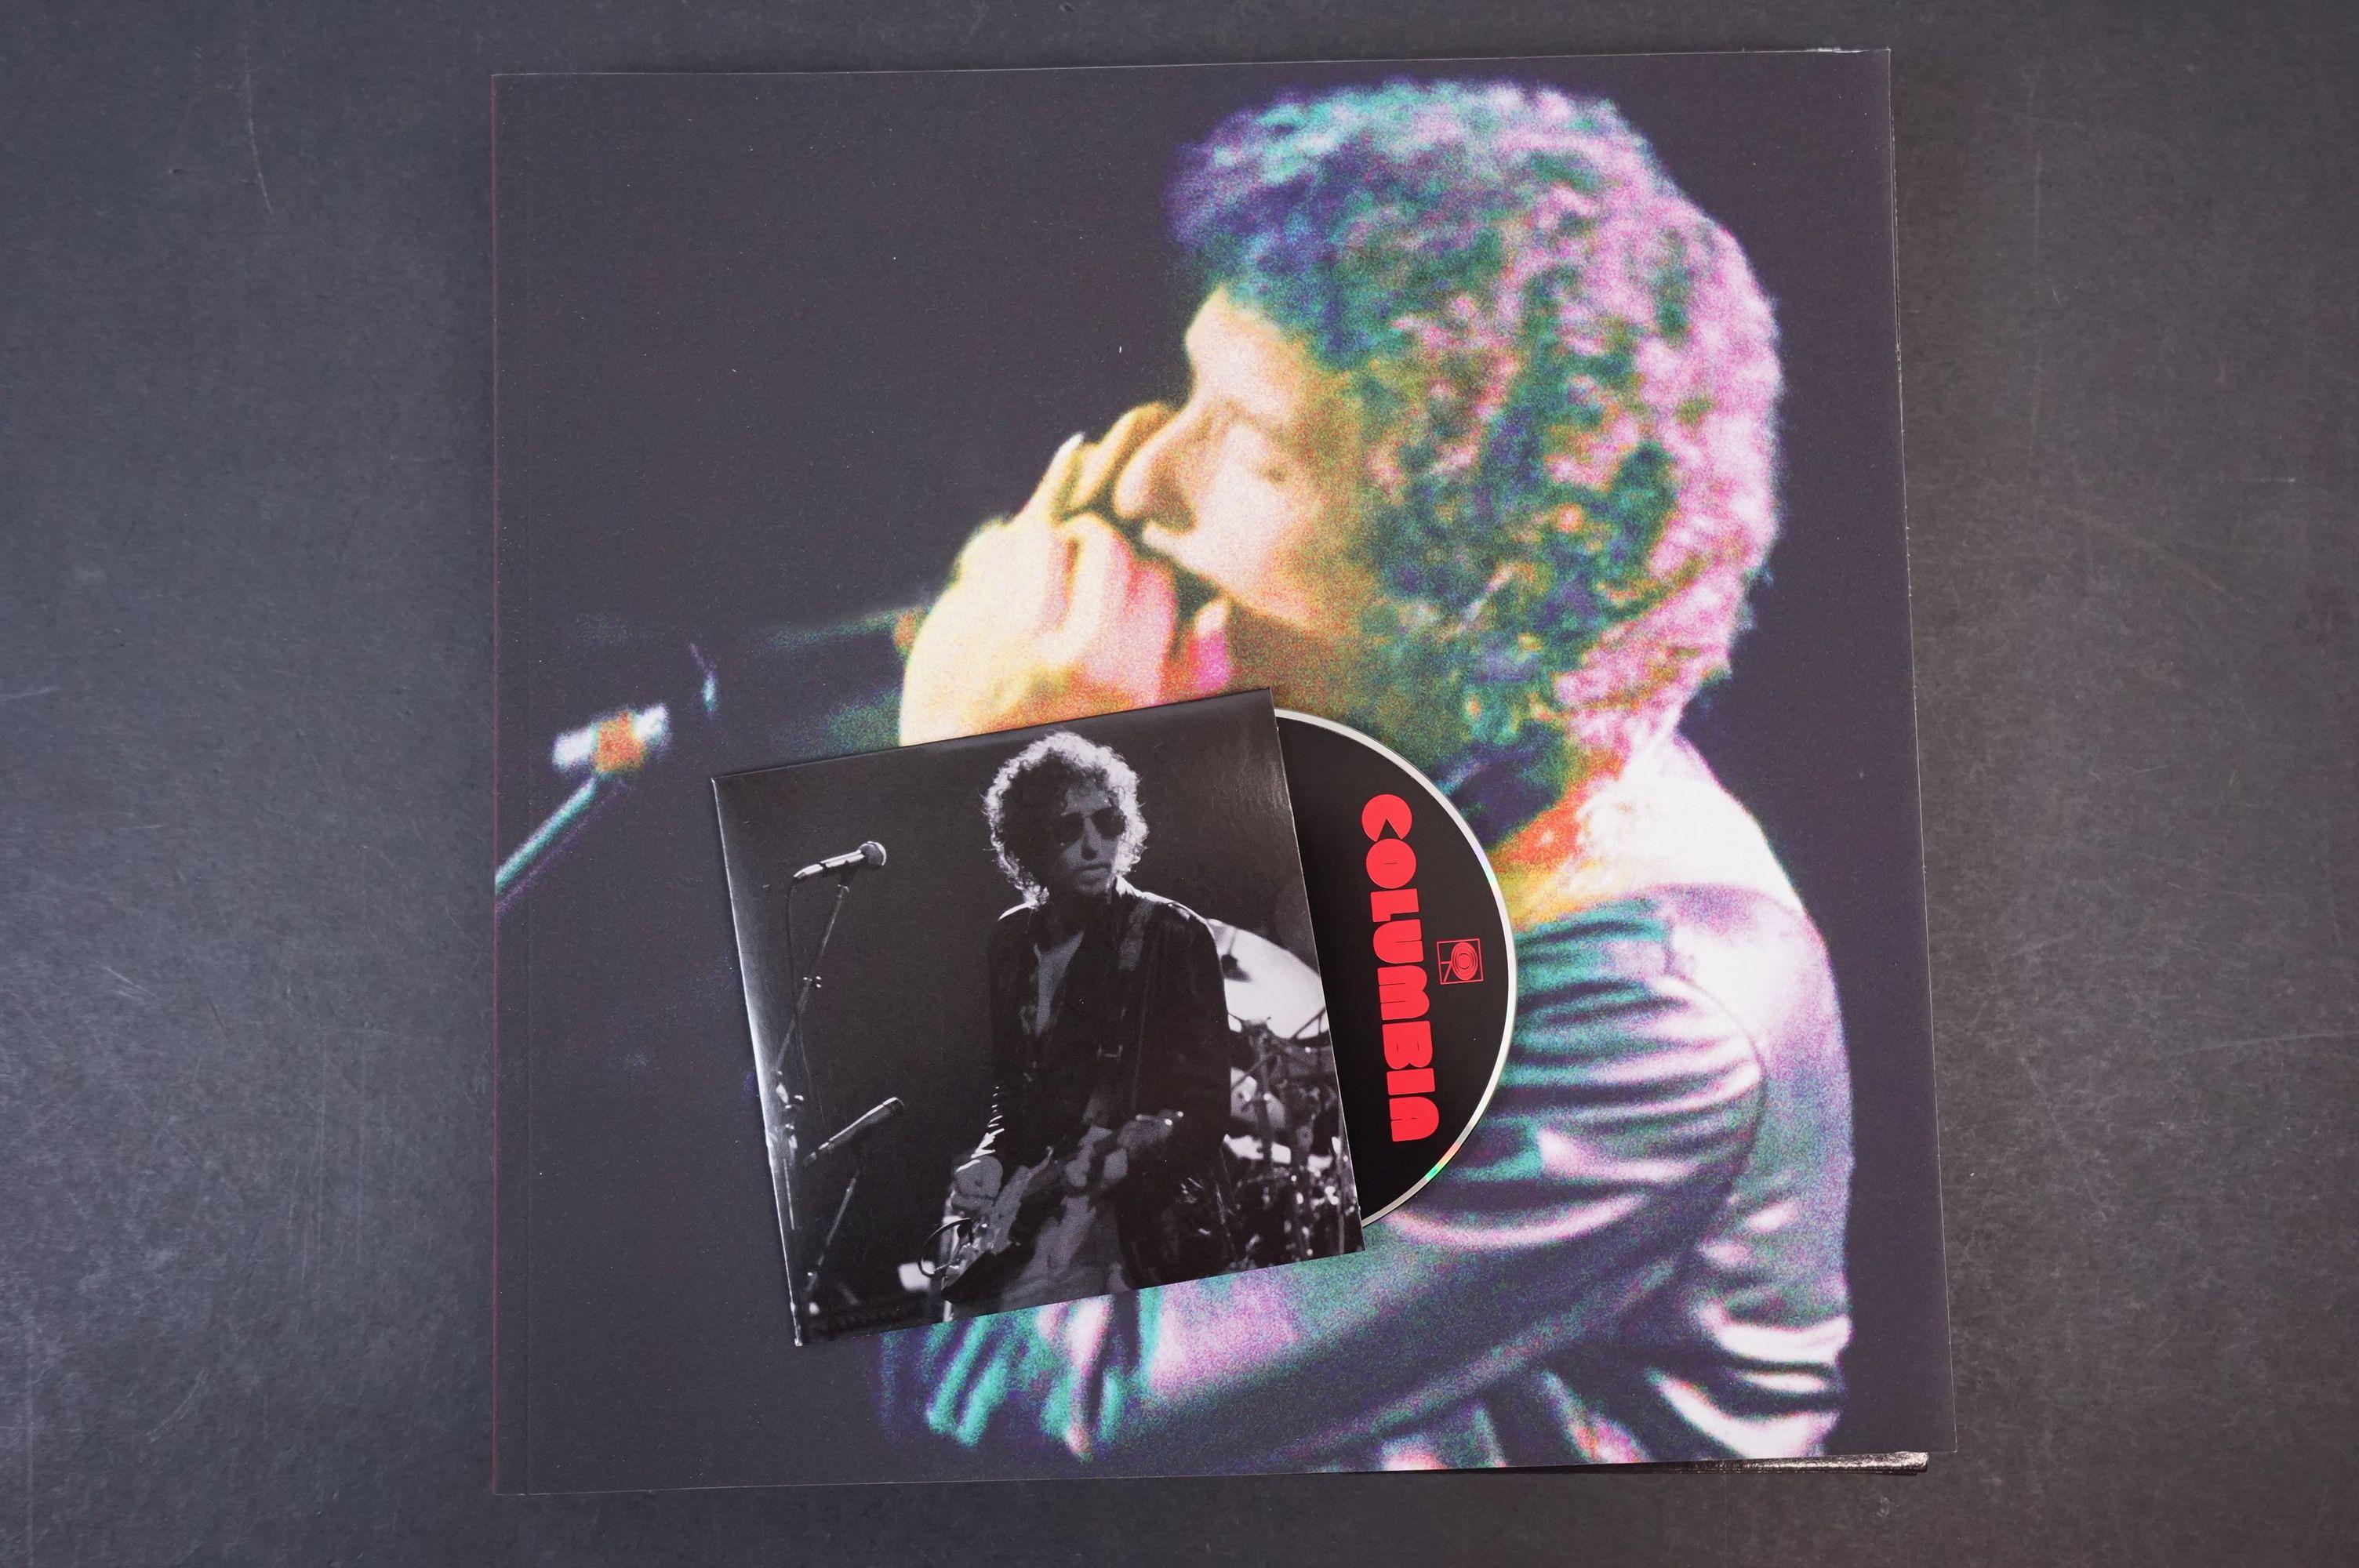 Vinyl - Bob Dylan Trouble No More The Bootleg Series vol 13 1979-1981 4 LP Box Set, ex - Image 8 of 9